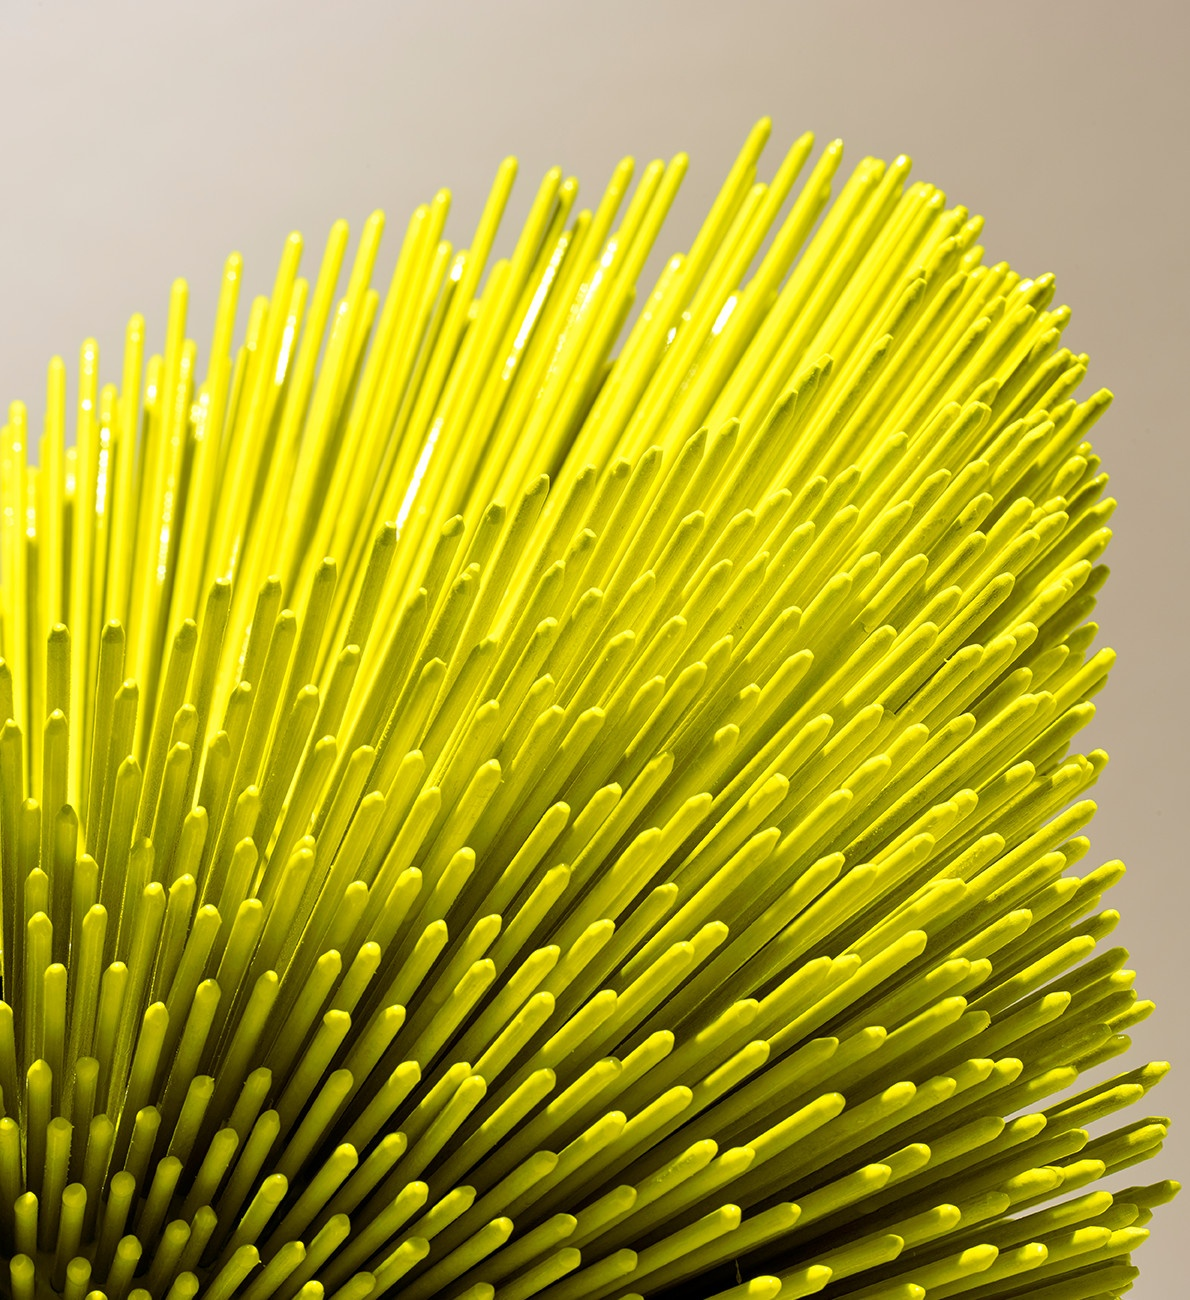 sea-anemone-yellow-3-header_01